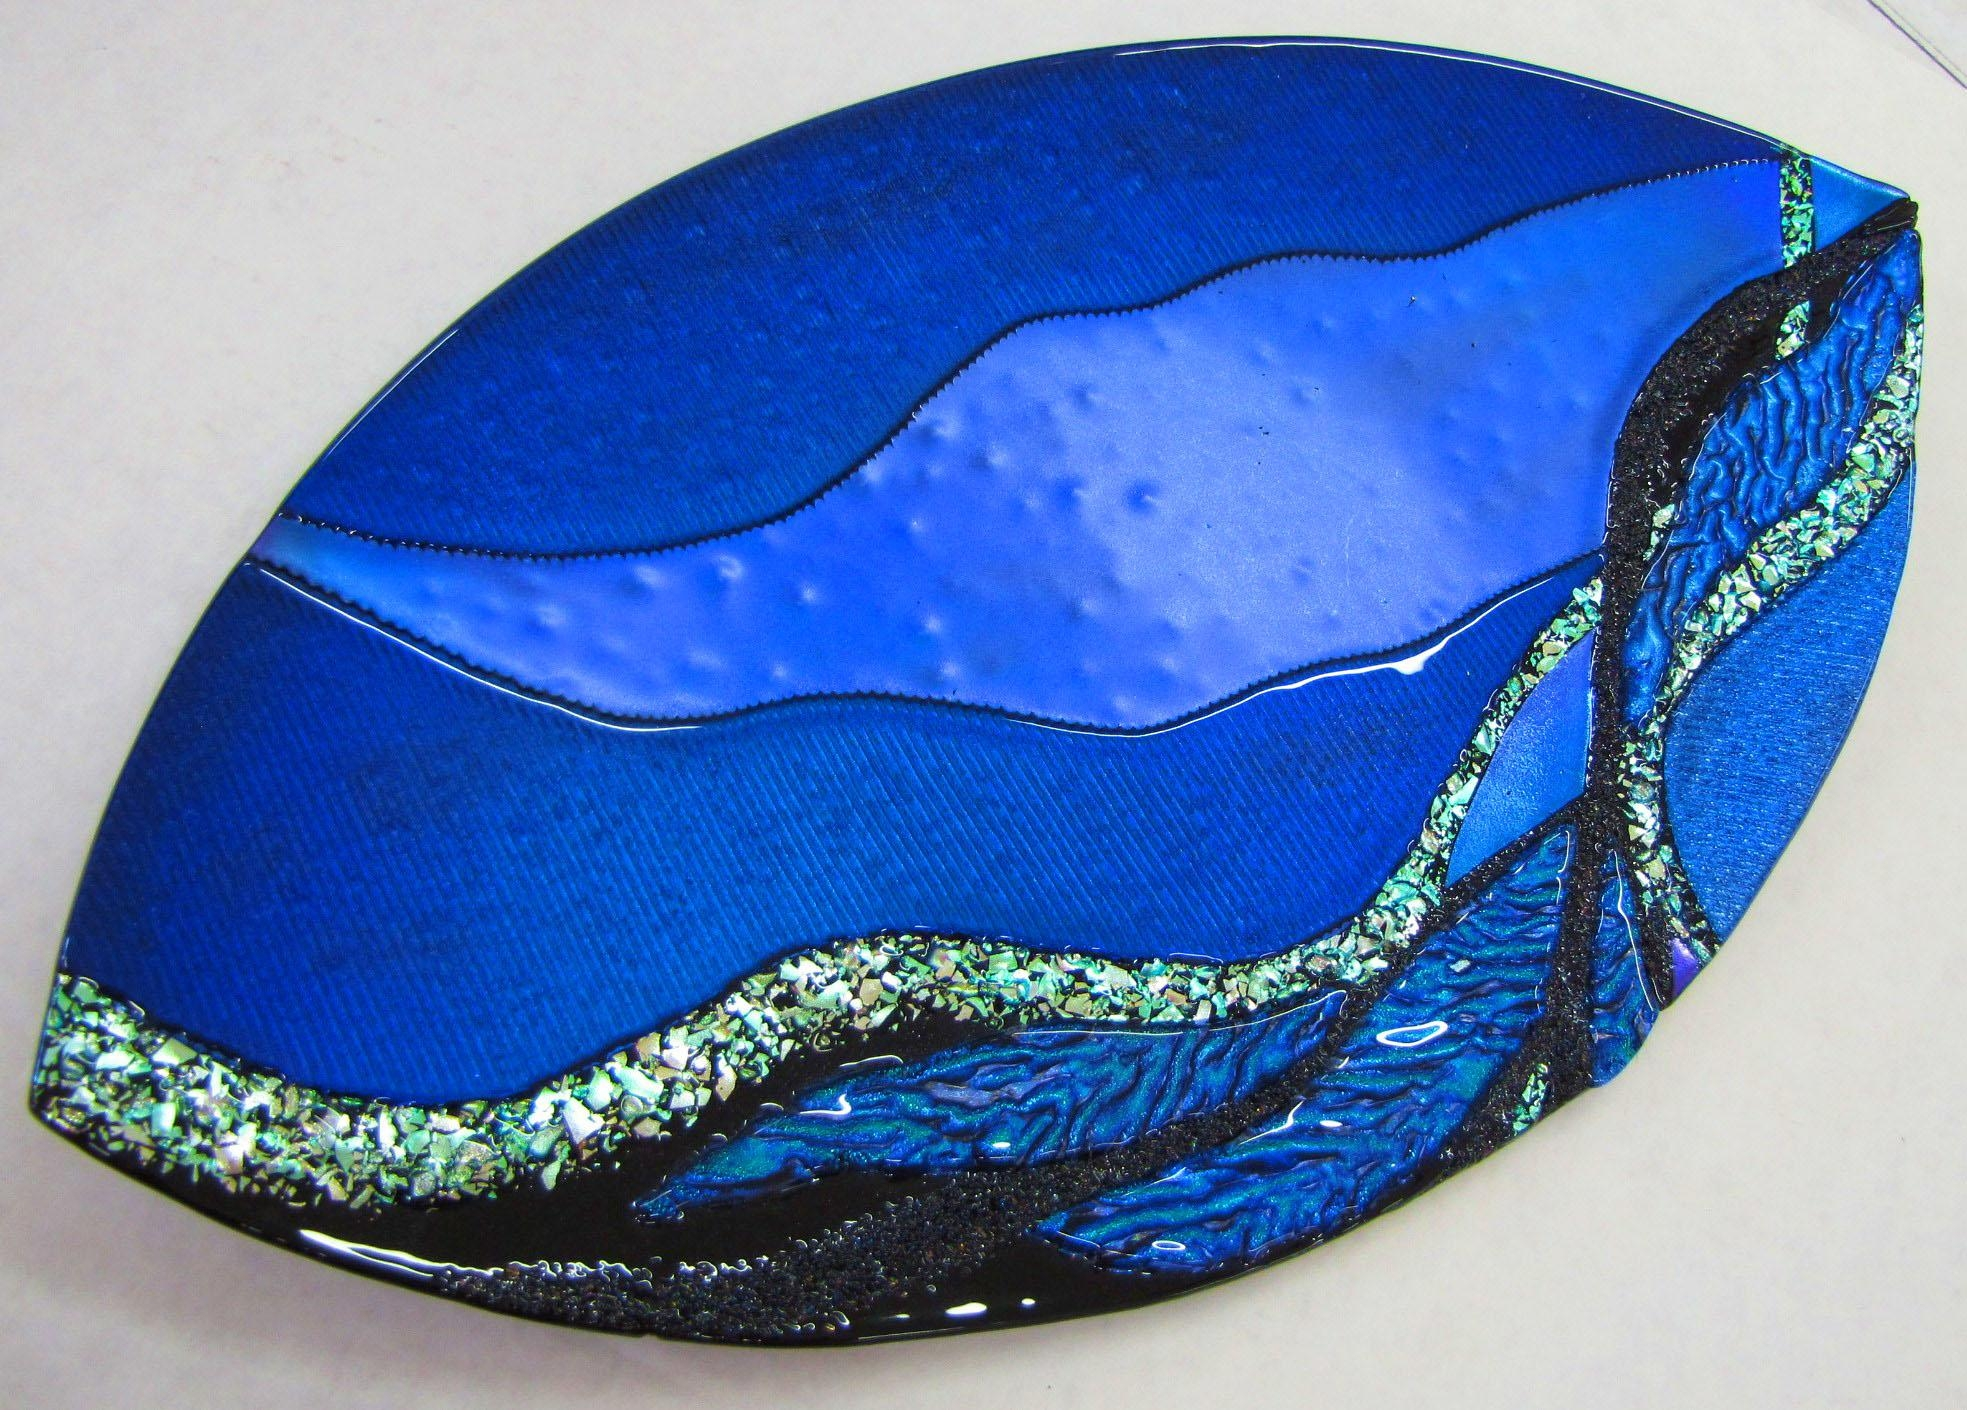 Art Glass Gallery – Teresa Kowalski Fused Glass Regarding Fused Dichroic Glass Wall Art (View 9 of 20)